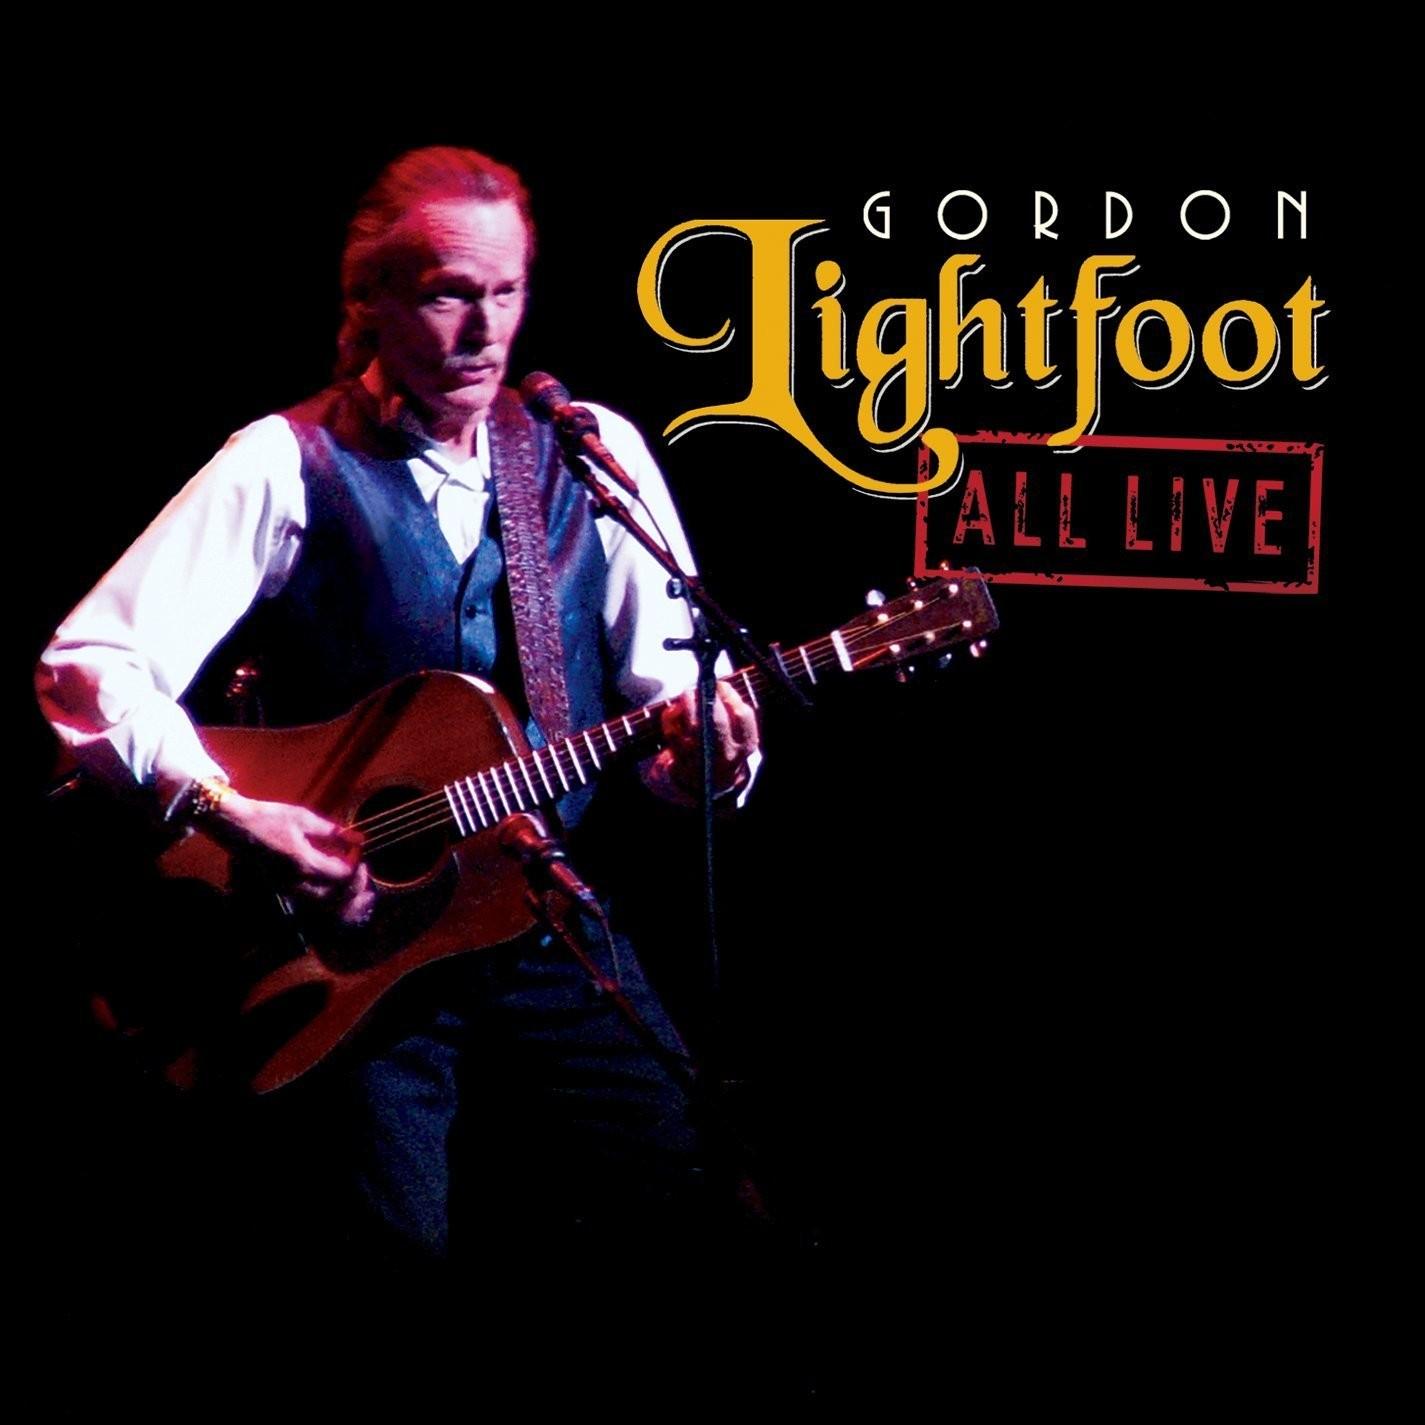 Gordon Lightfoot - All Live 2XLP